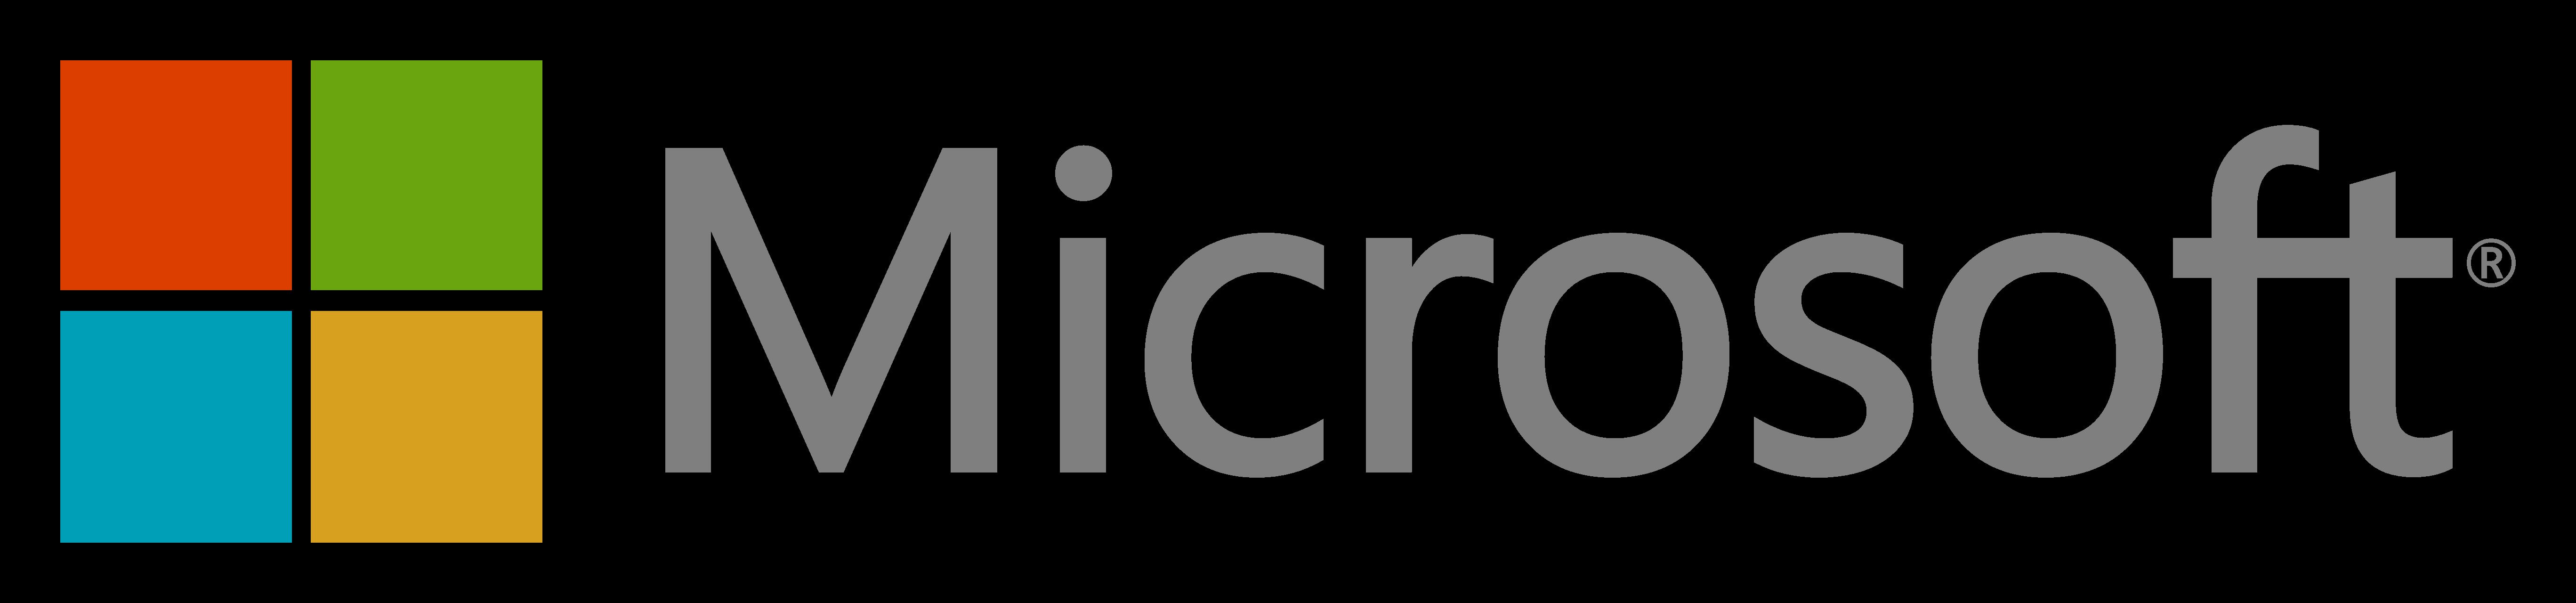 microsoftlogopngtransparentbackground1